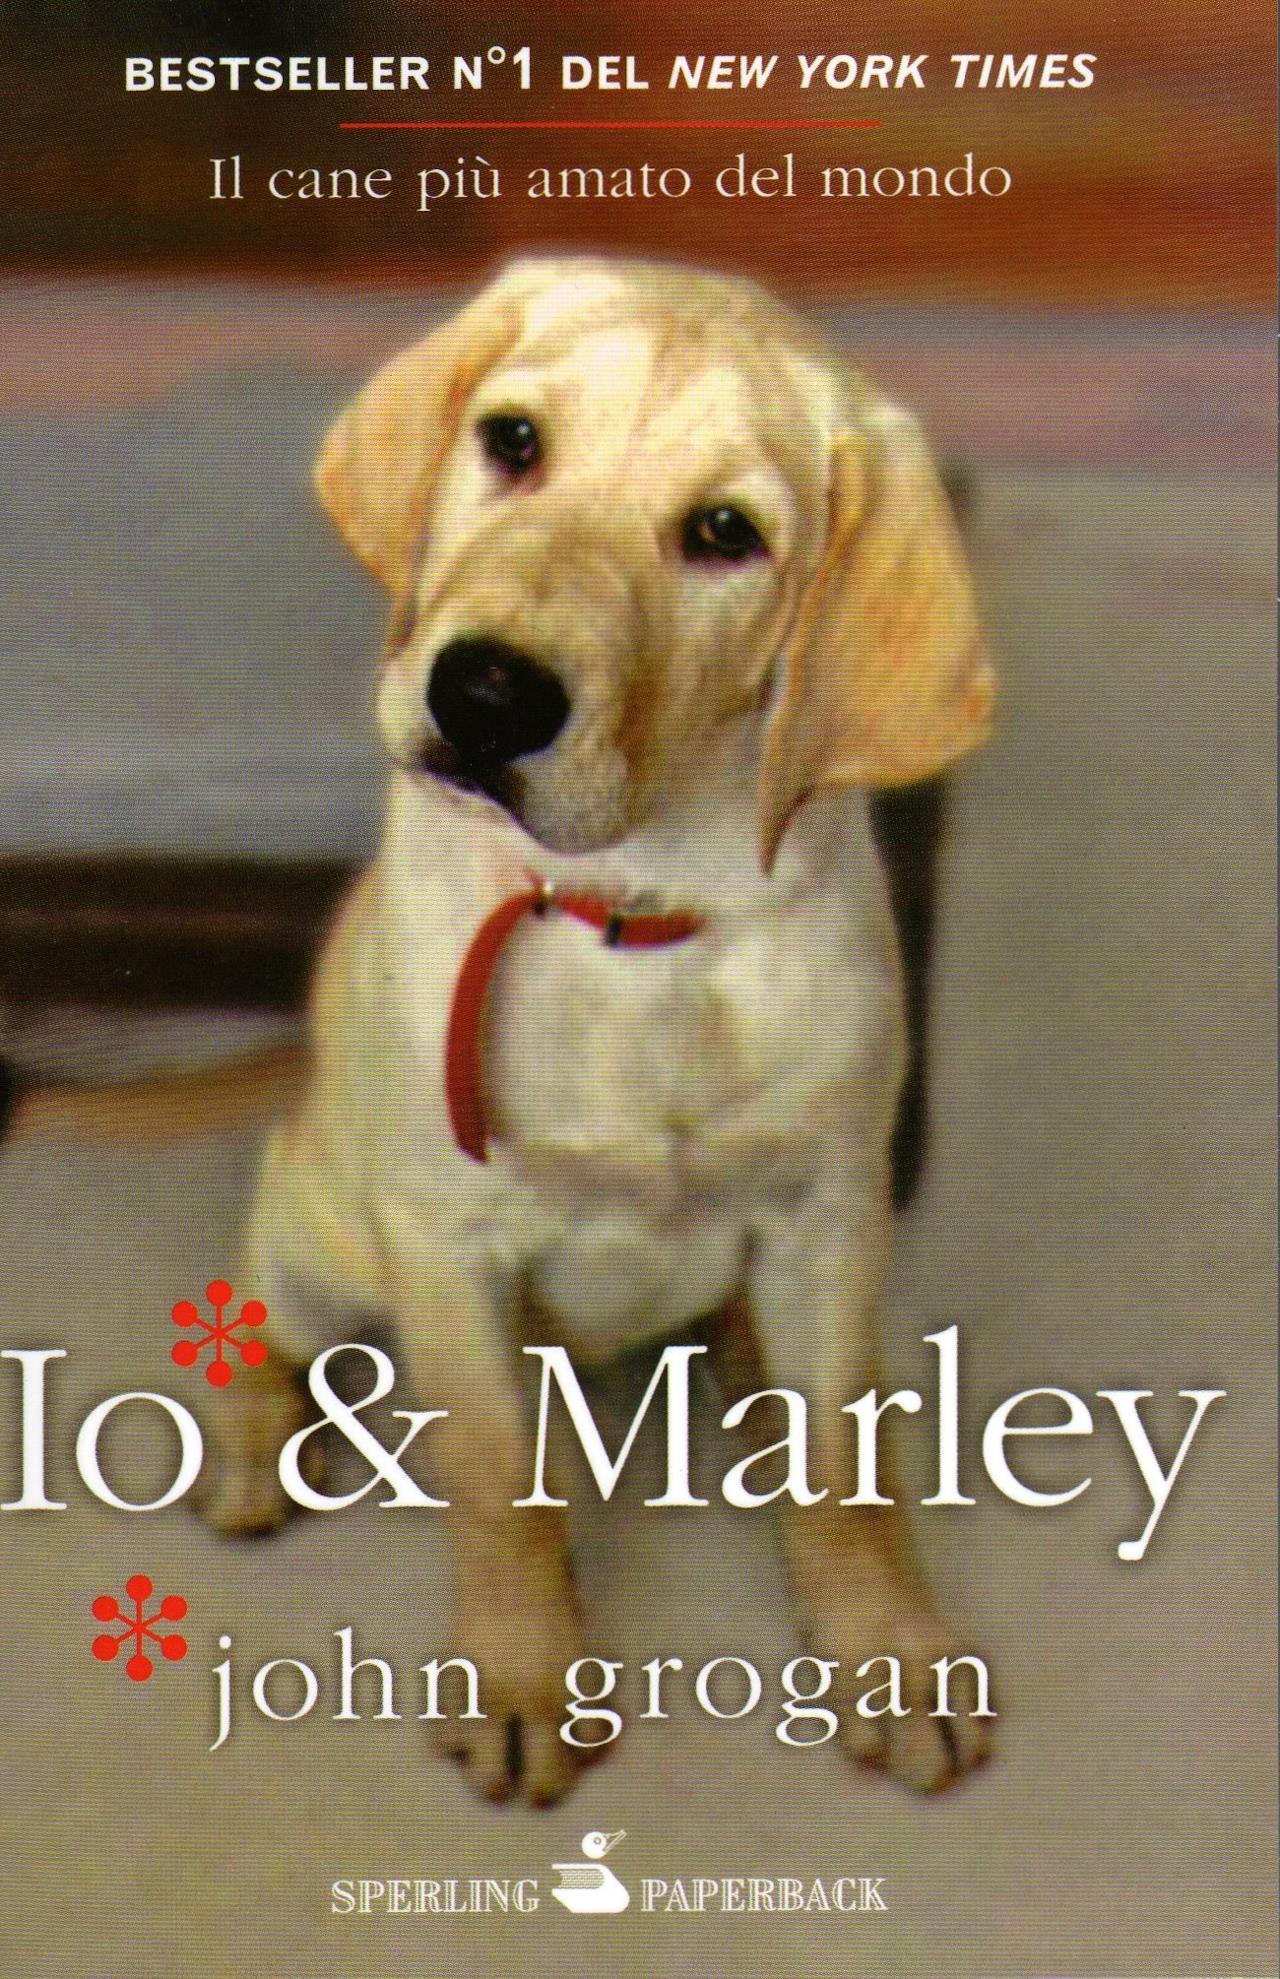 Le Più Belle Frasi Di Io E Marley Libro E Film